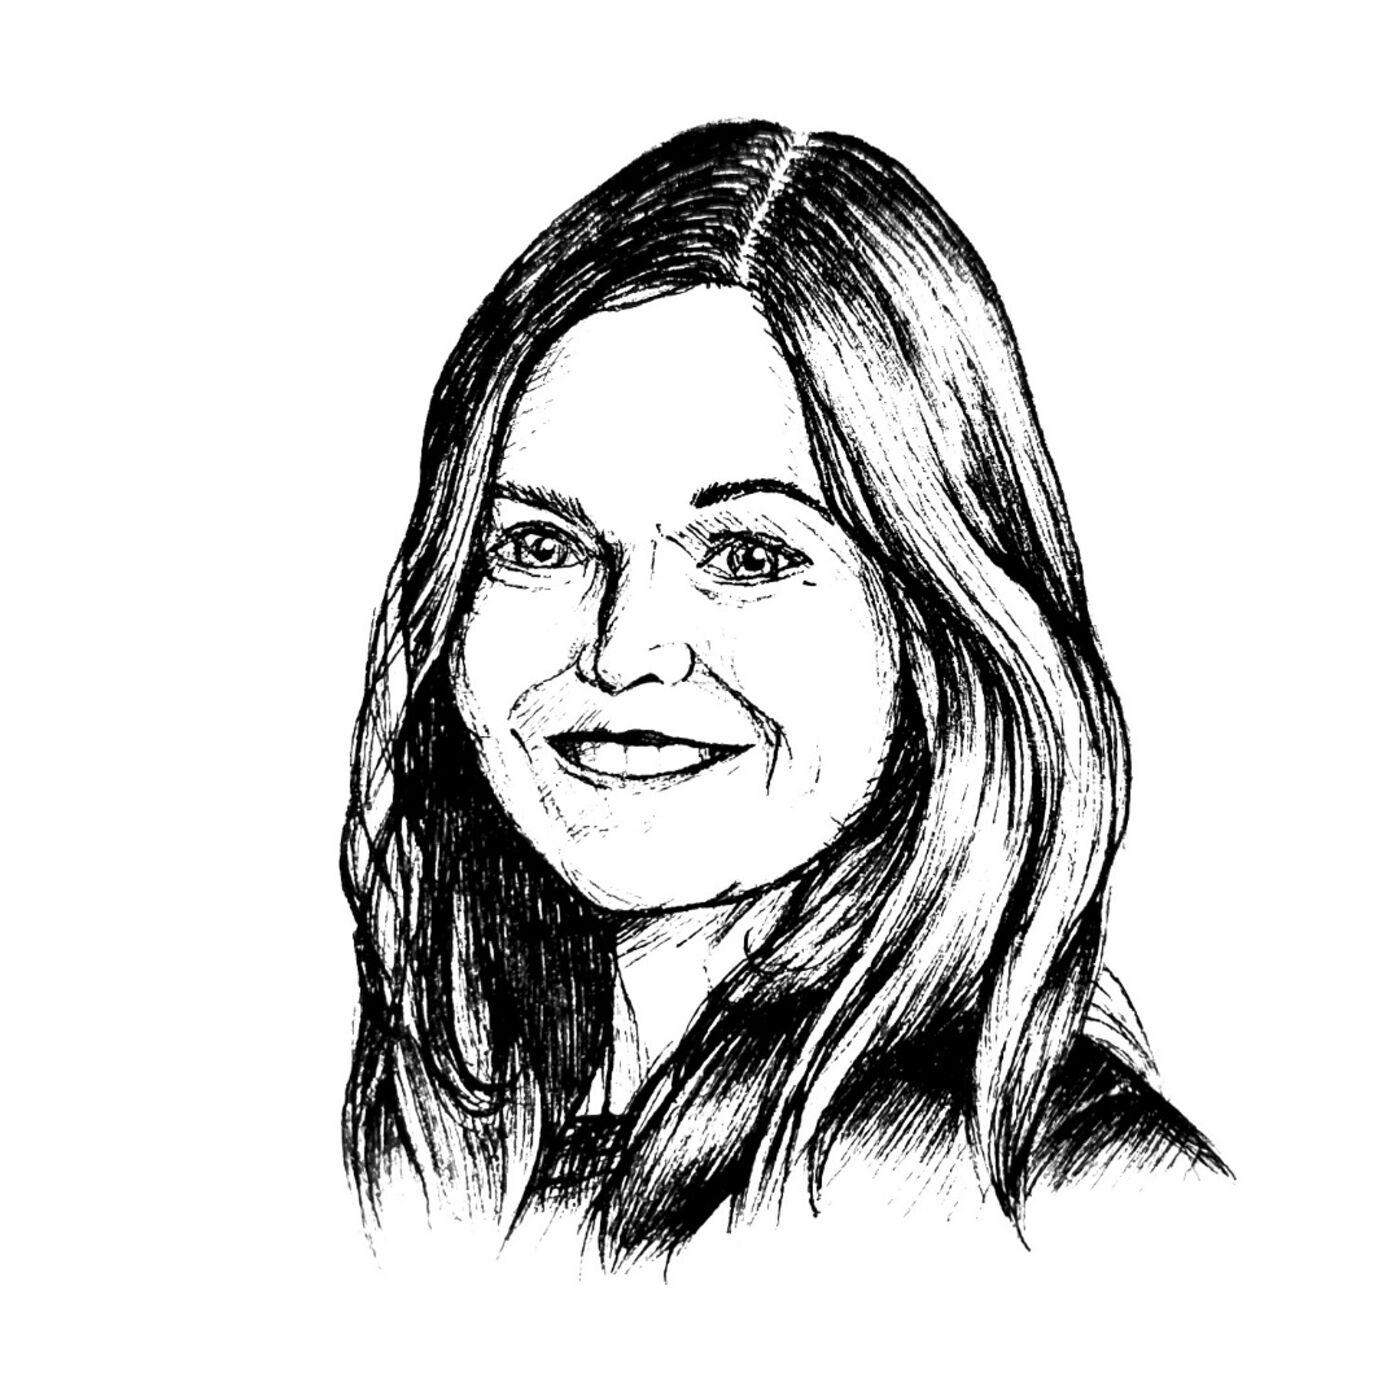 Episode 12: Elise Westhoff & protecting investments of philanthropy